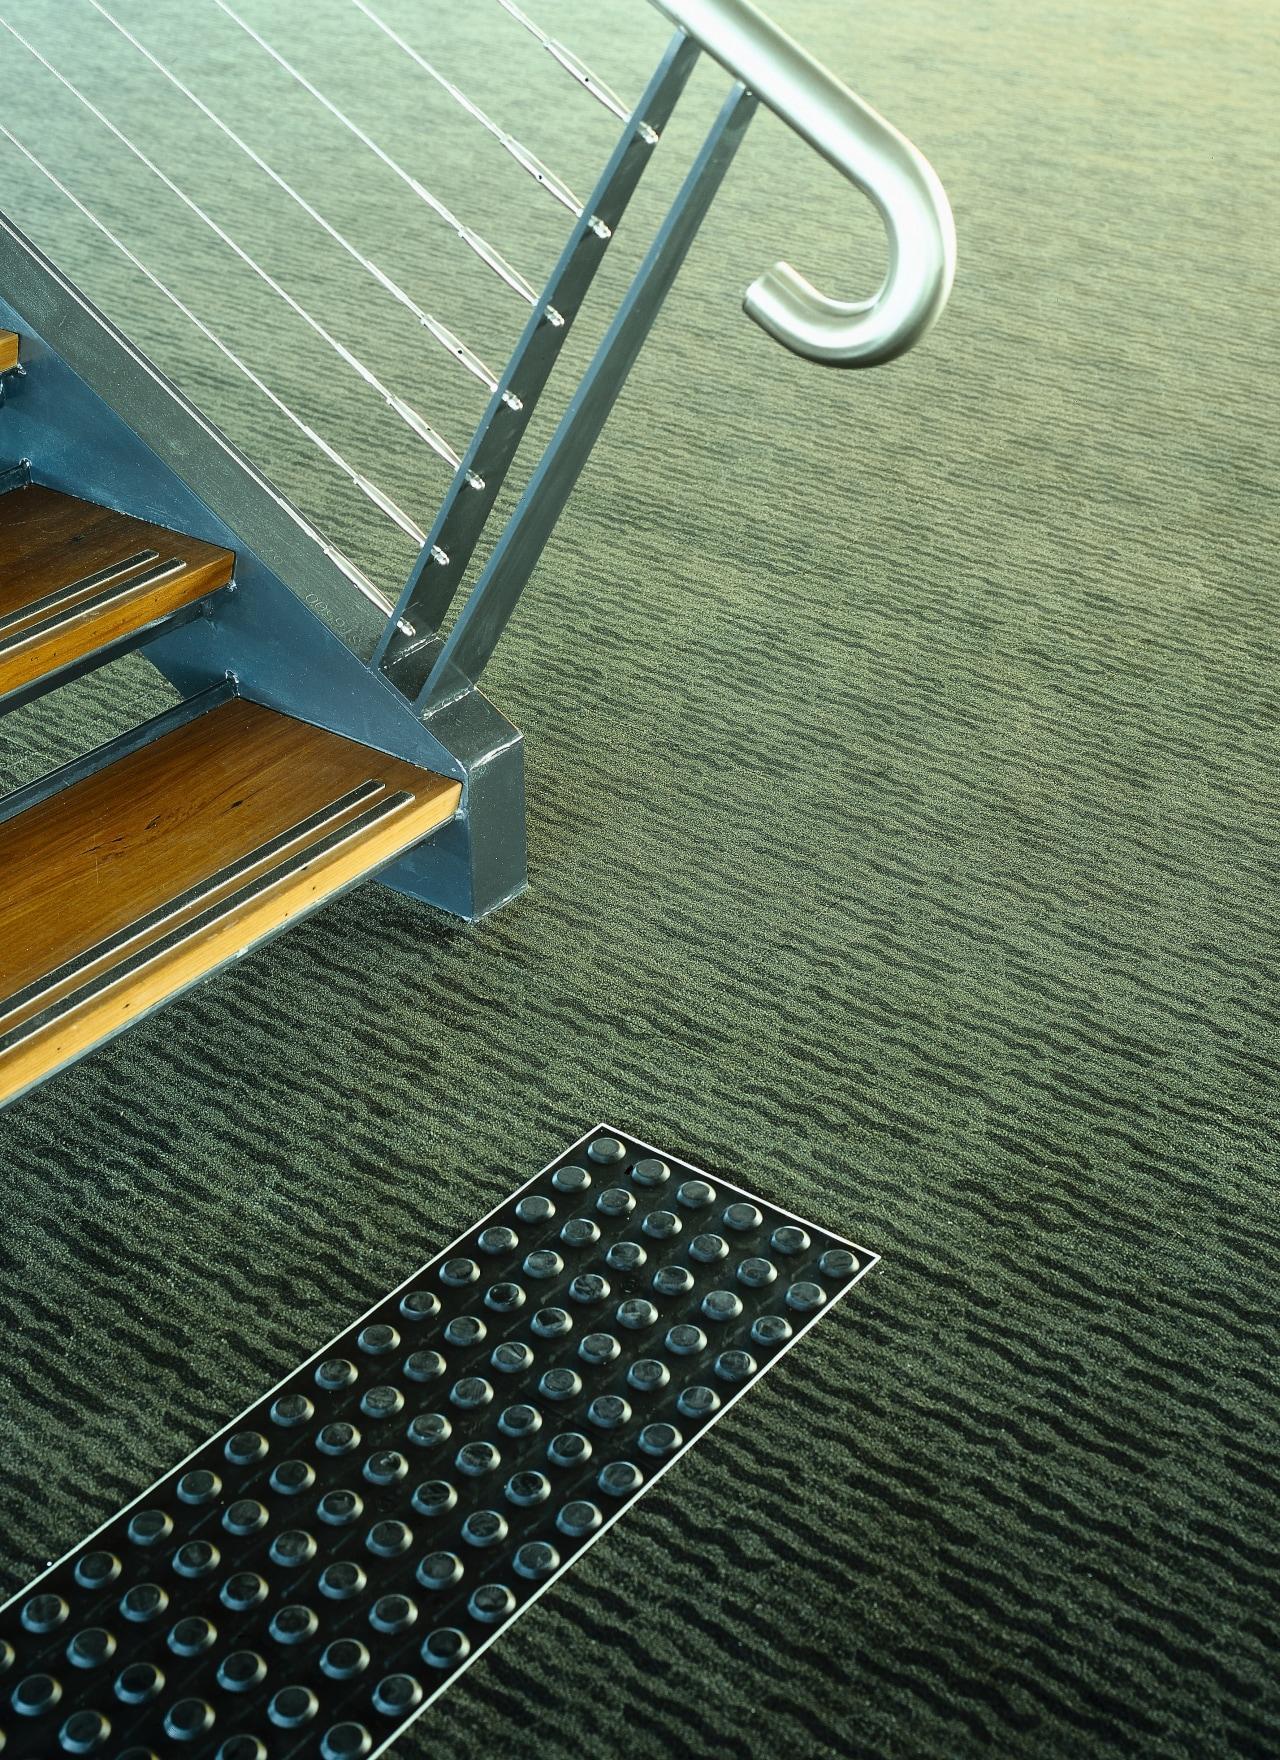 view of the carpets by onterra floor, line, mesh, metal, green, black